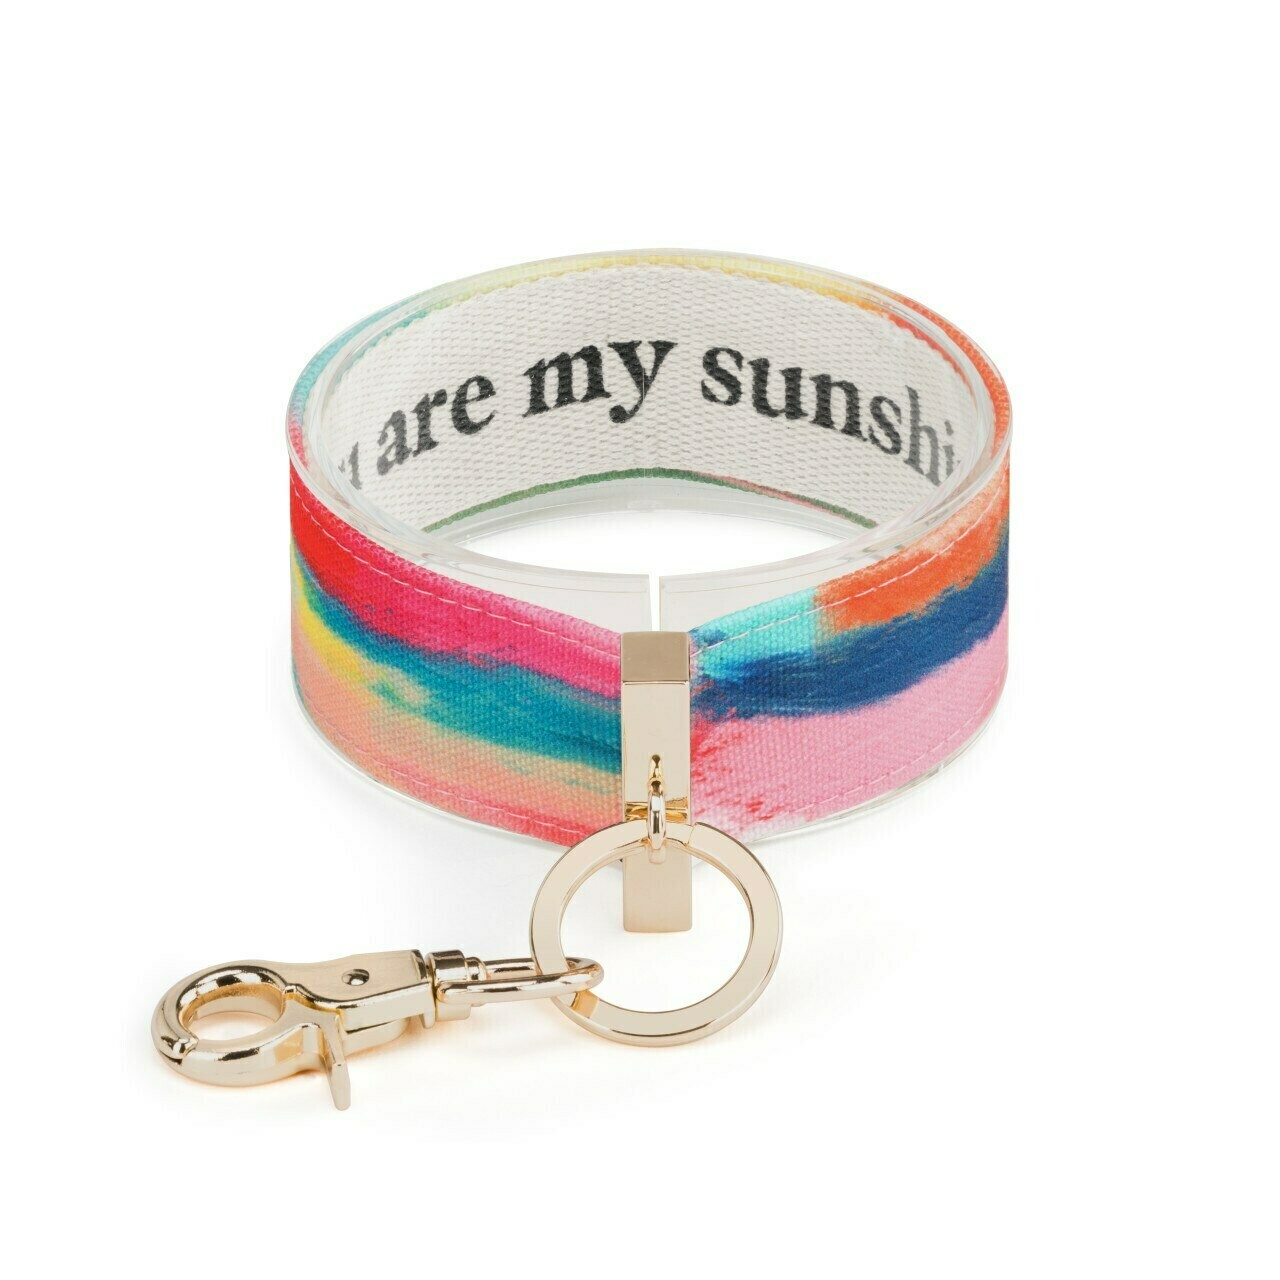 Demdaco Wrist Strap Key Ring YOU ARE MY SUNSHINE